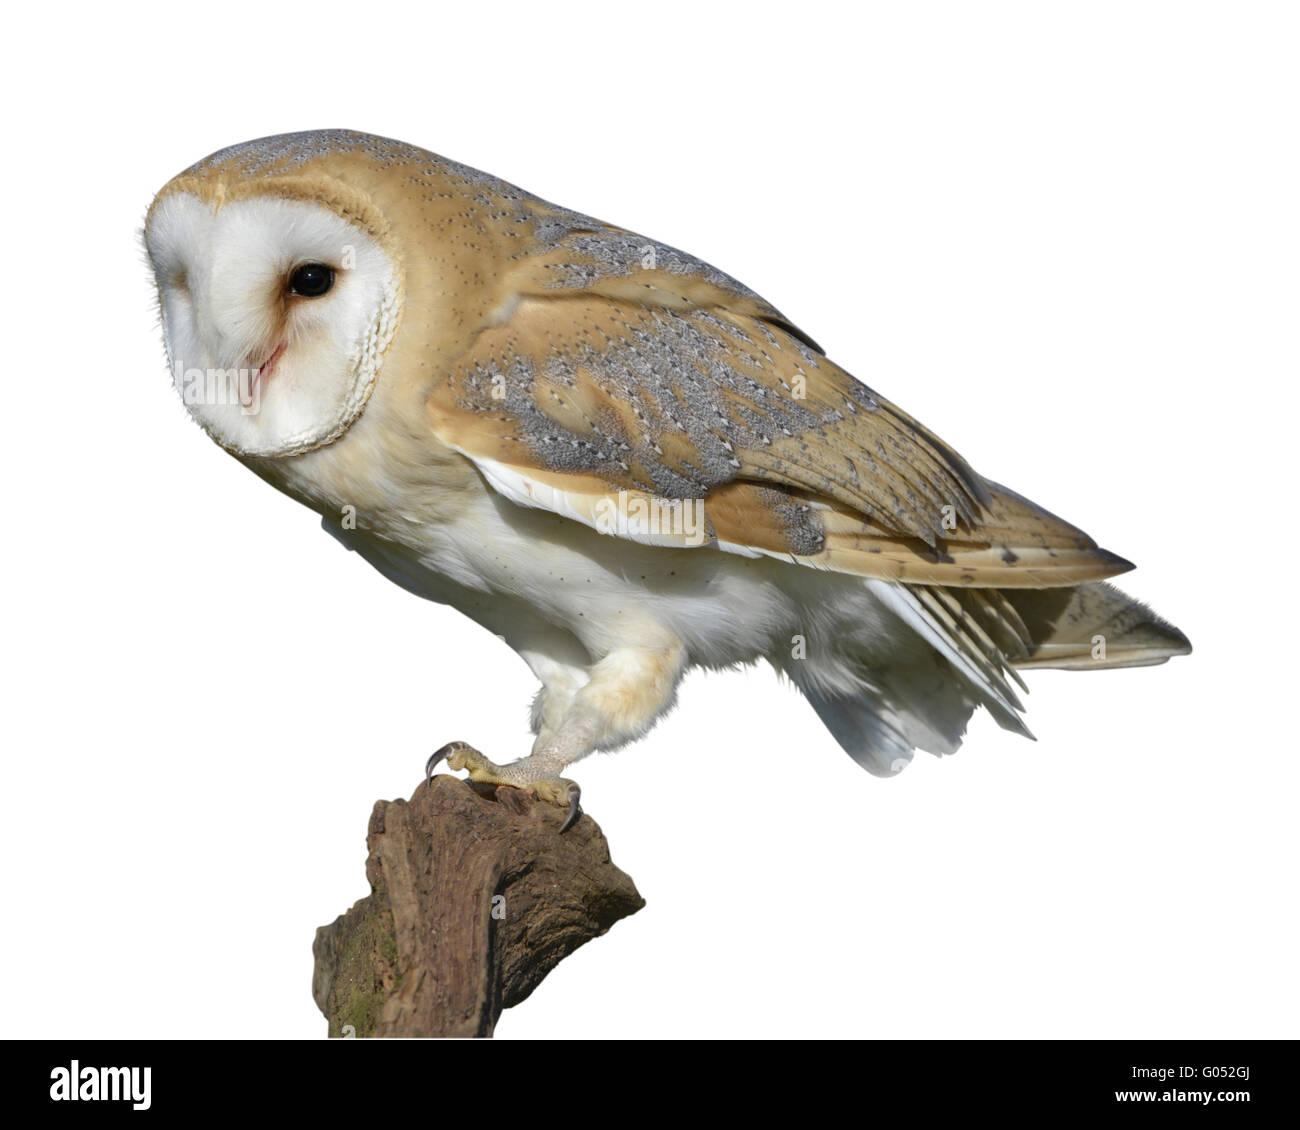 Lechuza - Tyto alba Imagen De Stock